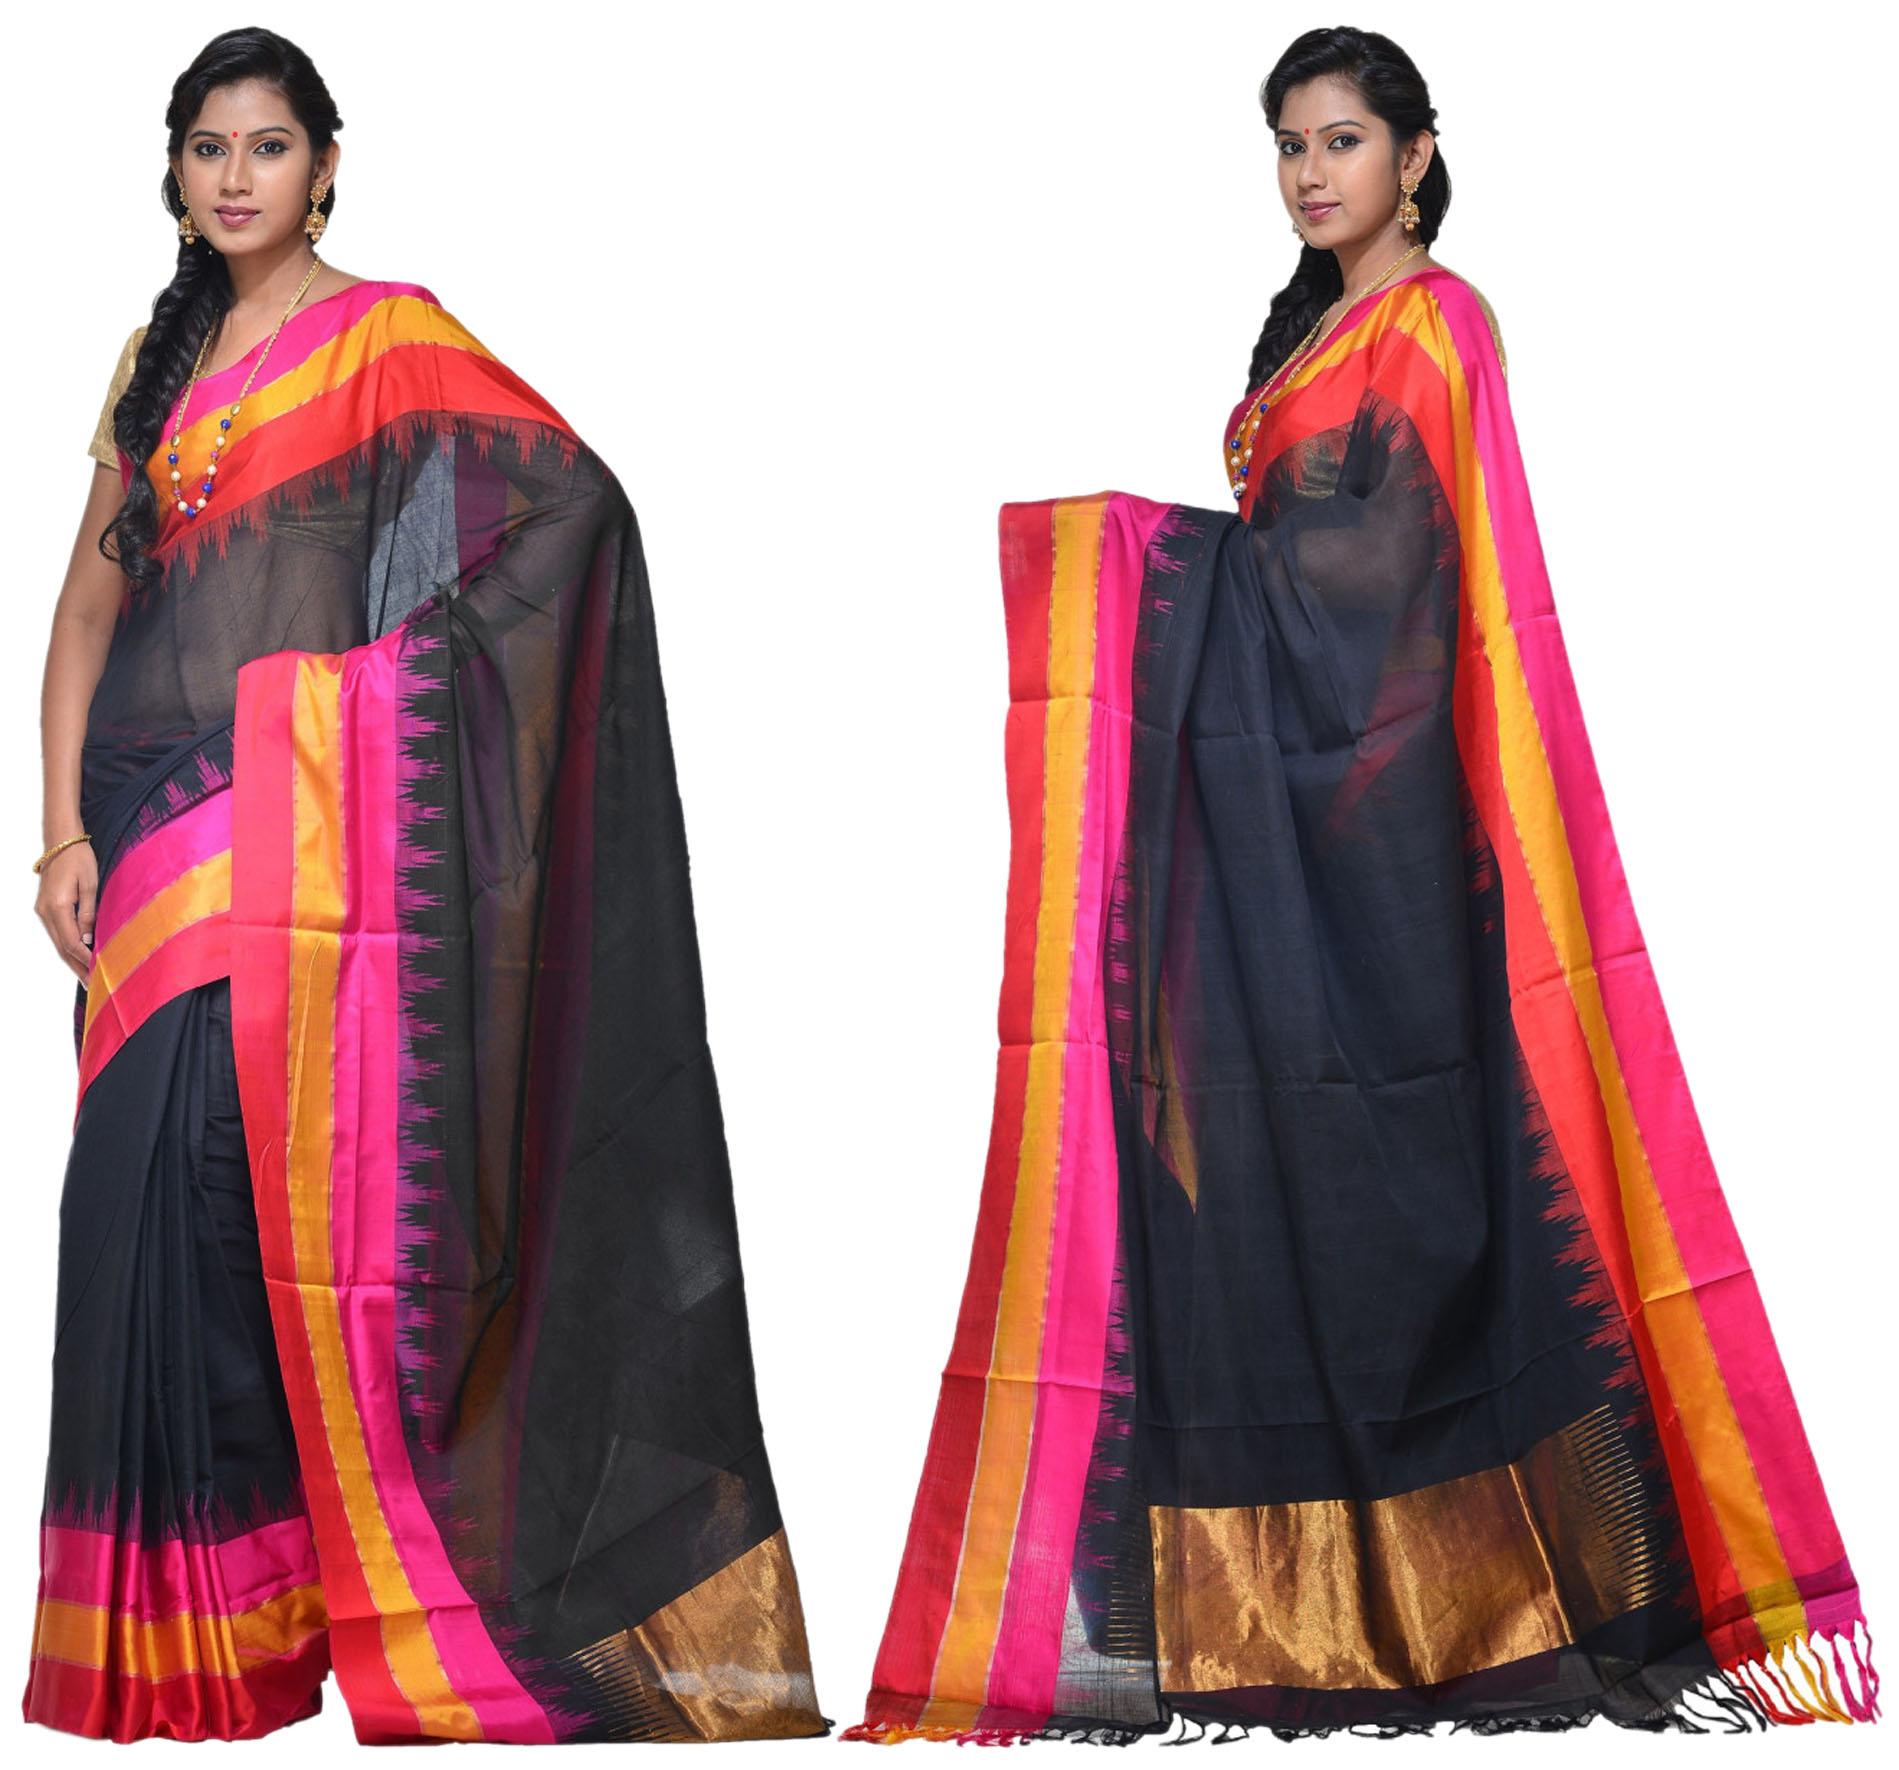 Price: - 9000/-   New designs of khadi sarees, khadi cotton silk sarees, khadi cotton fabric, khadi silk sarees. Sign up now for E-book you will be updated with latest collection of ethnic verities. For More Info Click on :- www.uppada.com  We manufacture of Uppada sarees, Paithani sarees, Banarasi sarees, Venkatagiri Sarees, Gadwal Sarees, Khadi sarees, Hand Painted Kalamkari Dupatta, Ikkat sarees, Kanchipuram Sarees, Atr Poly Silk Sarees, Dupattas, Stoles etc. For more info us at 040 64640303, 441905005.  Buy online: - uppada.com  - by Paithani, Hyderabad